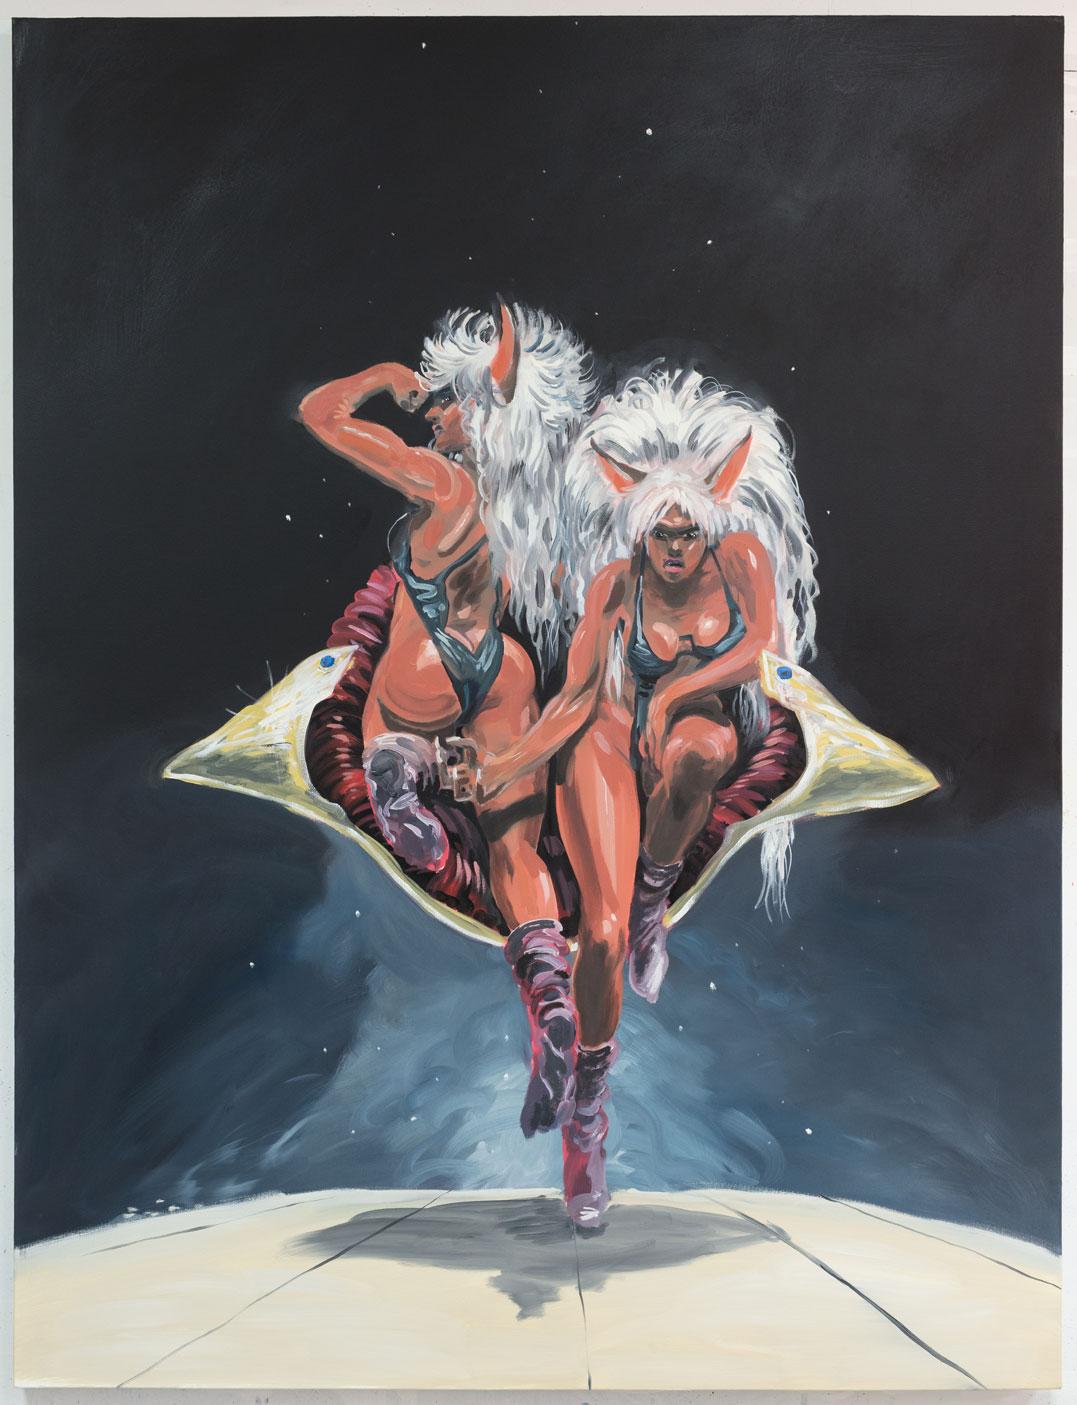 Puma Twins oil on canvas 60 x 80 inches 2017